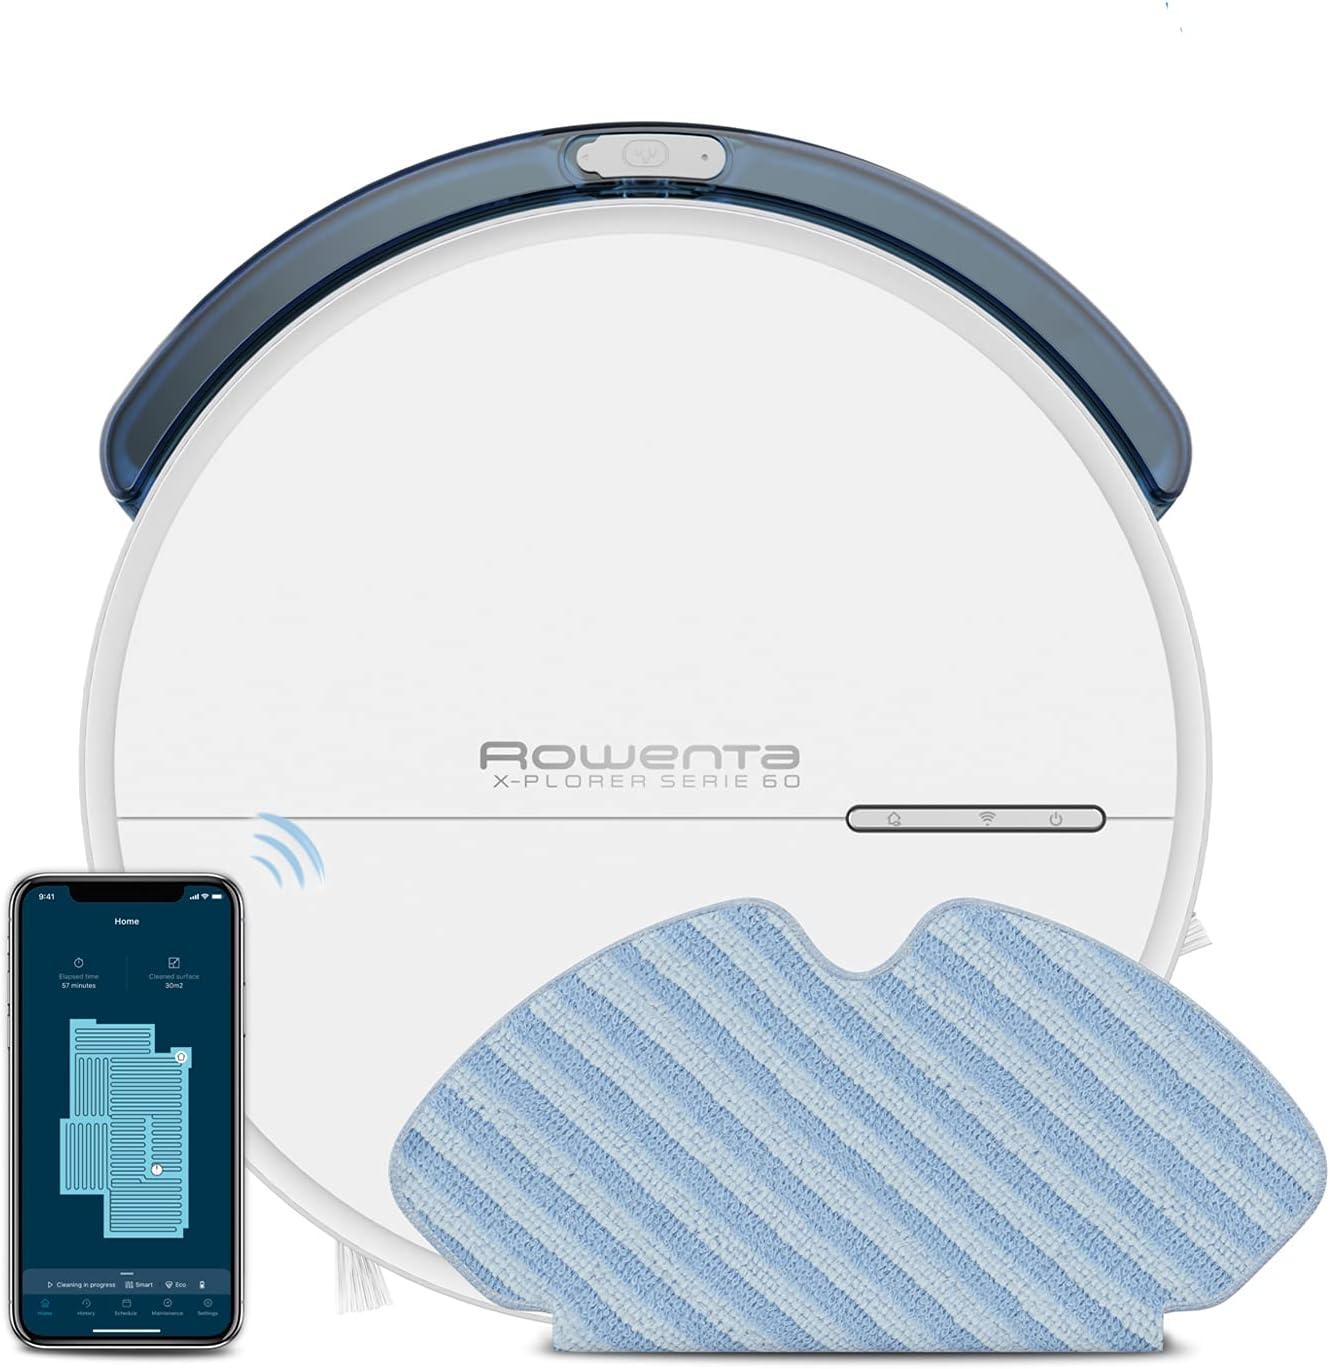 Rowenta X-Plorer Serie 60 Aspirateur robot, Navigation méthodique, Design ultrafin, Aspire et...